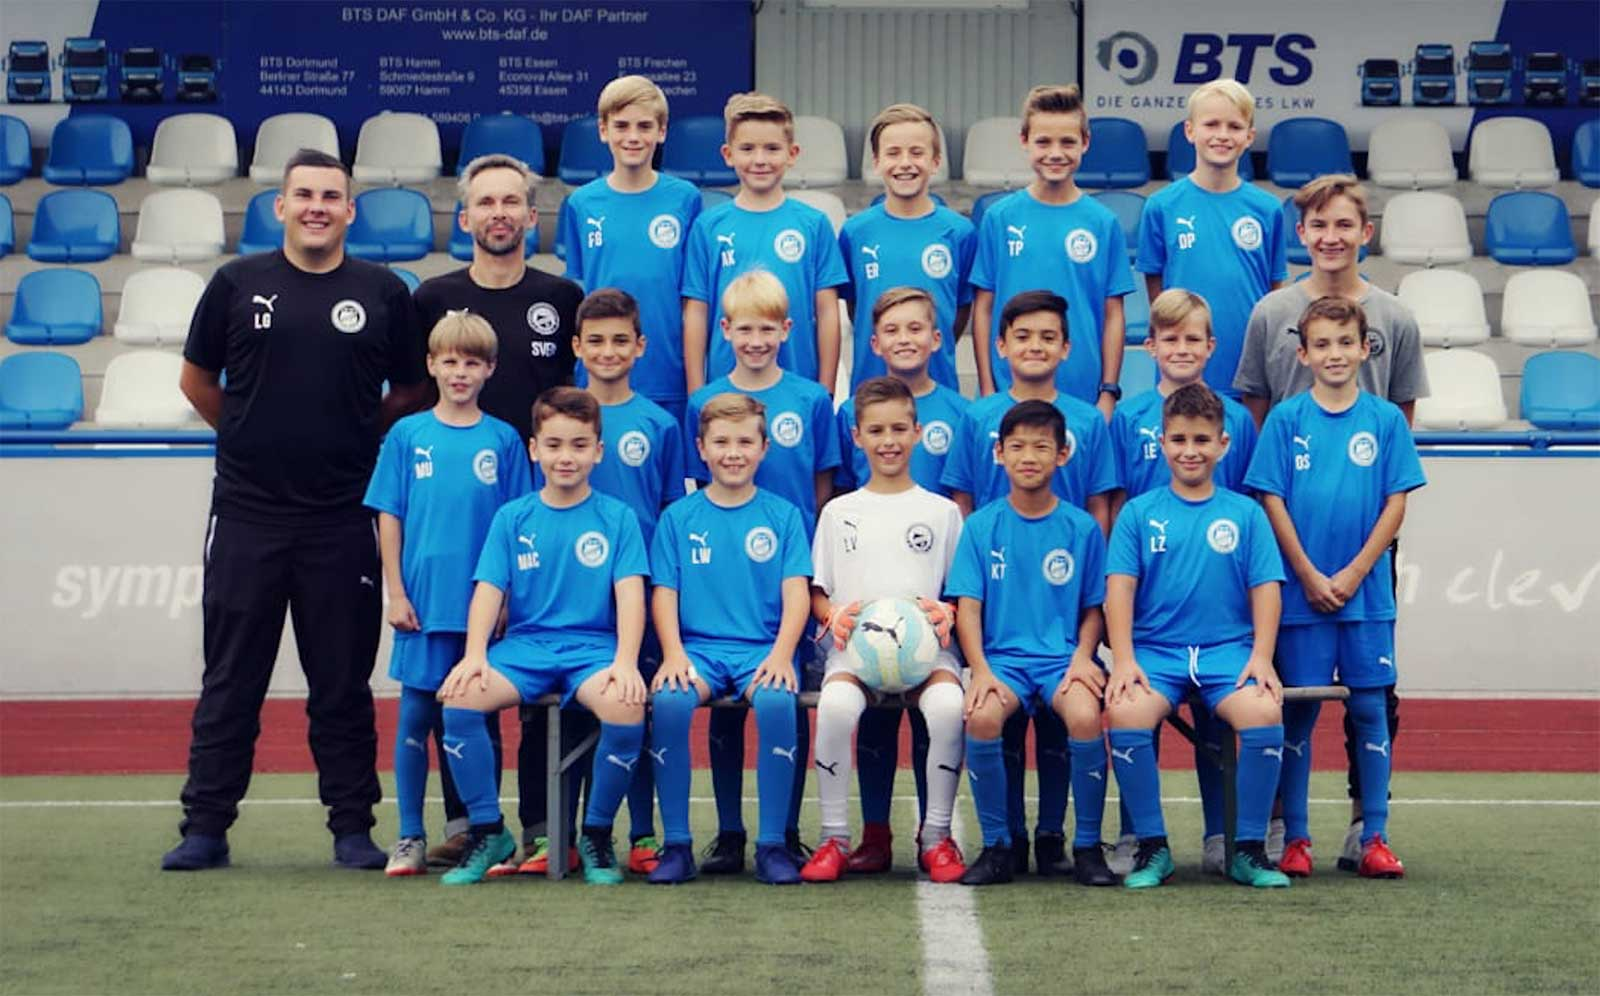 U11 - Jugendmannschaft des FC Brünninghausen